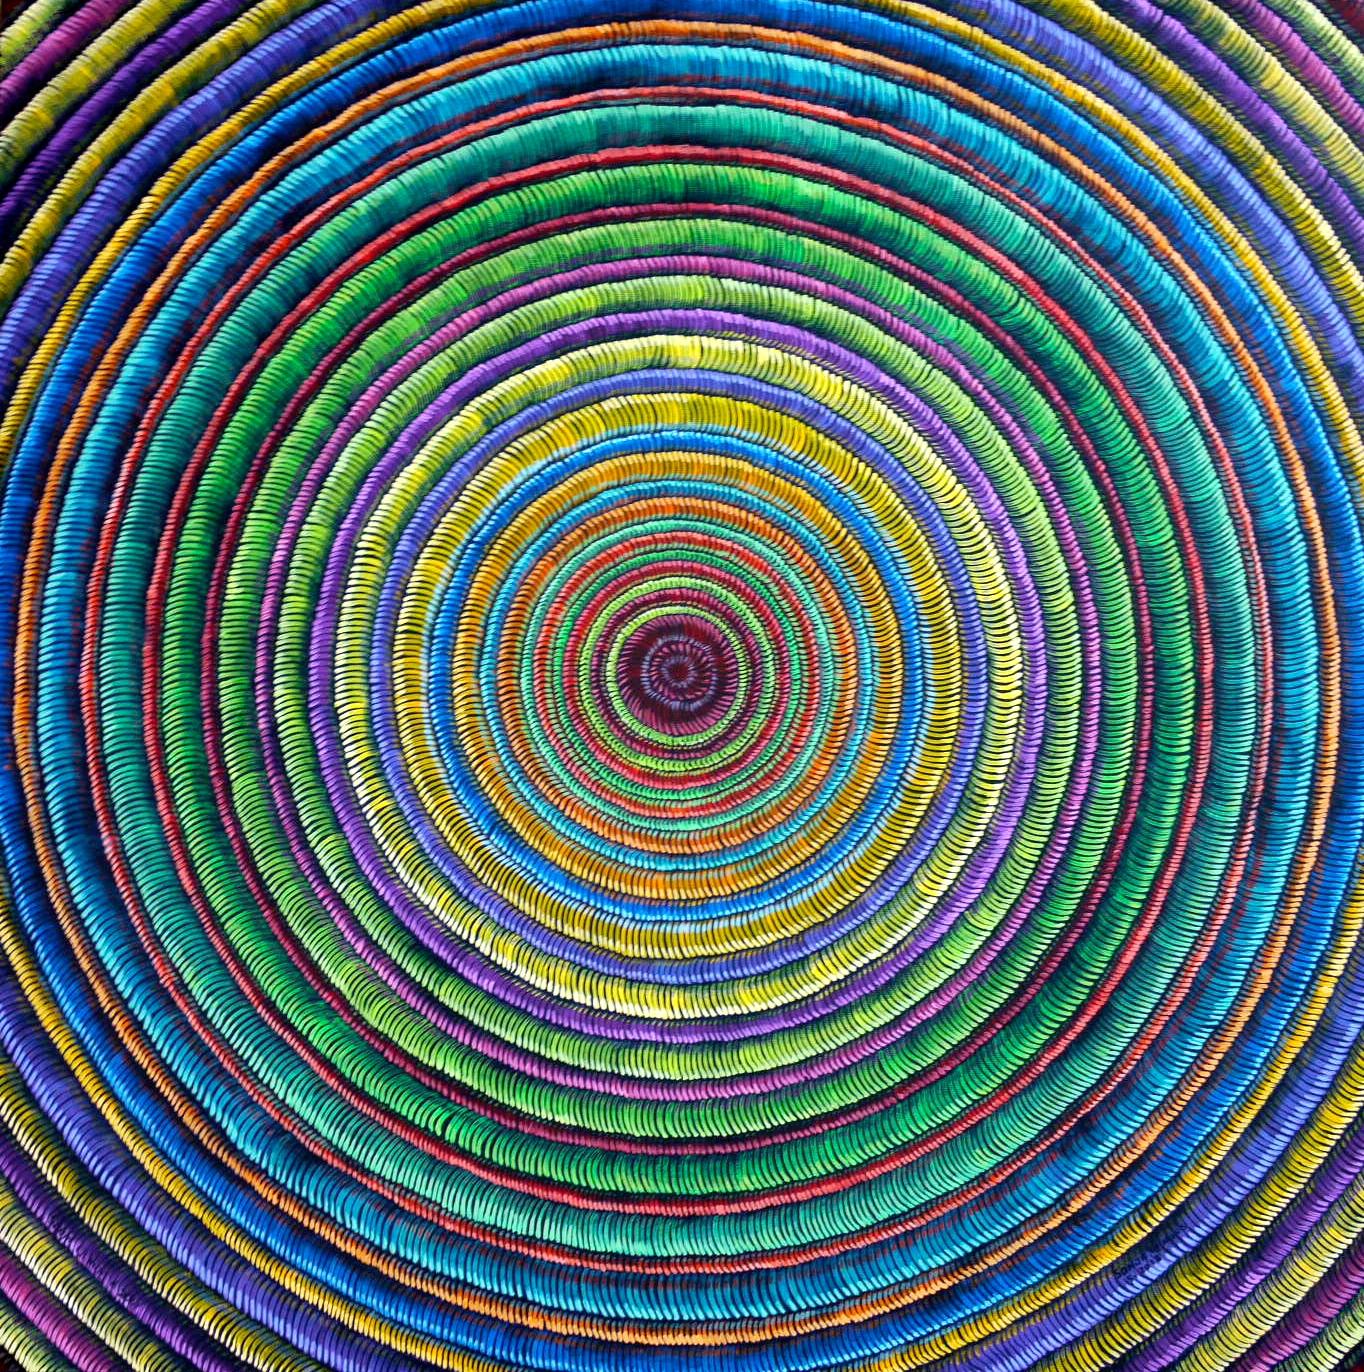 #472 - Fibrous Series (rainbow ripples) oil on canvas 24x24, 6/18 (6)